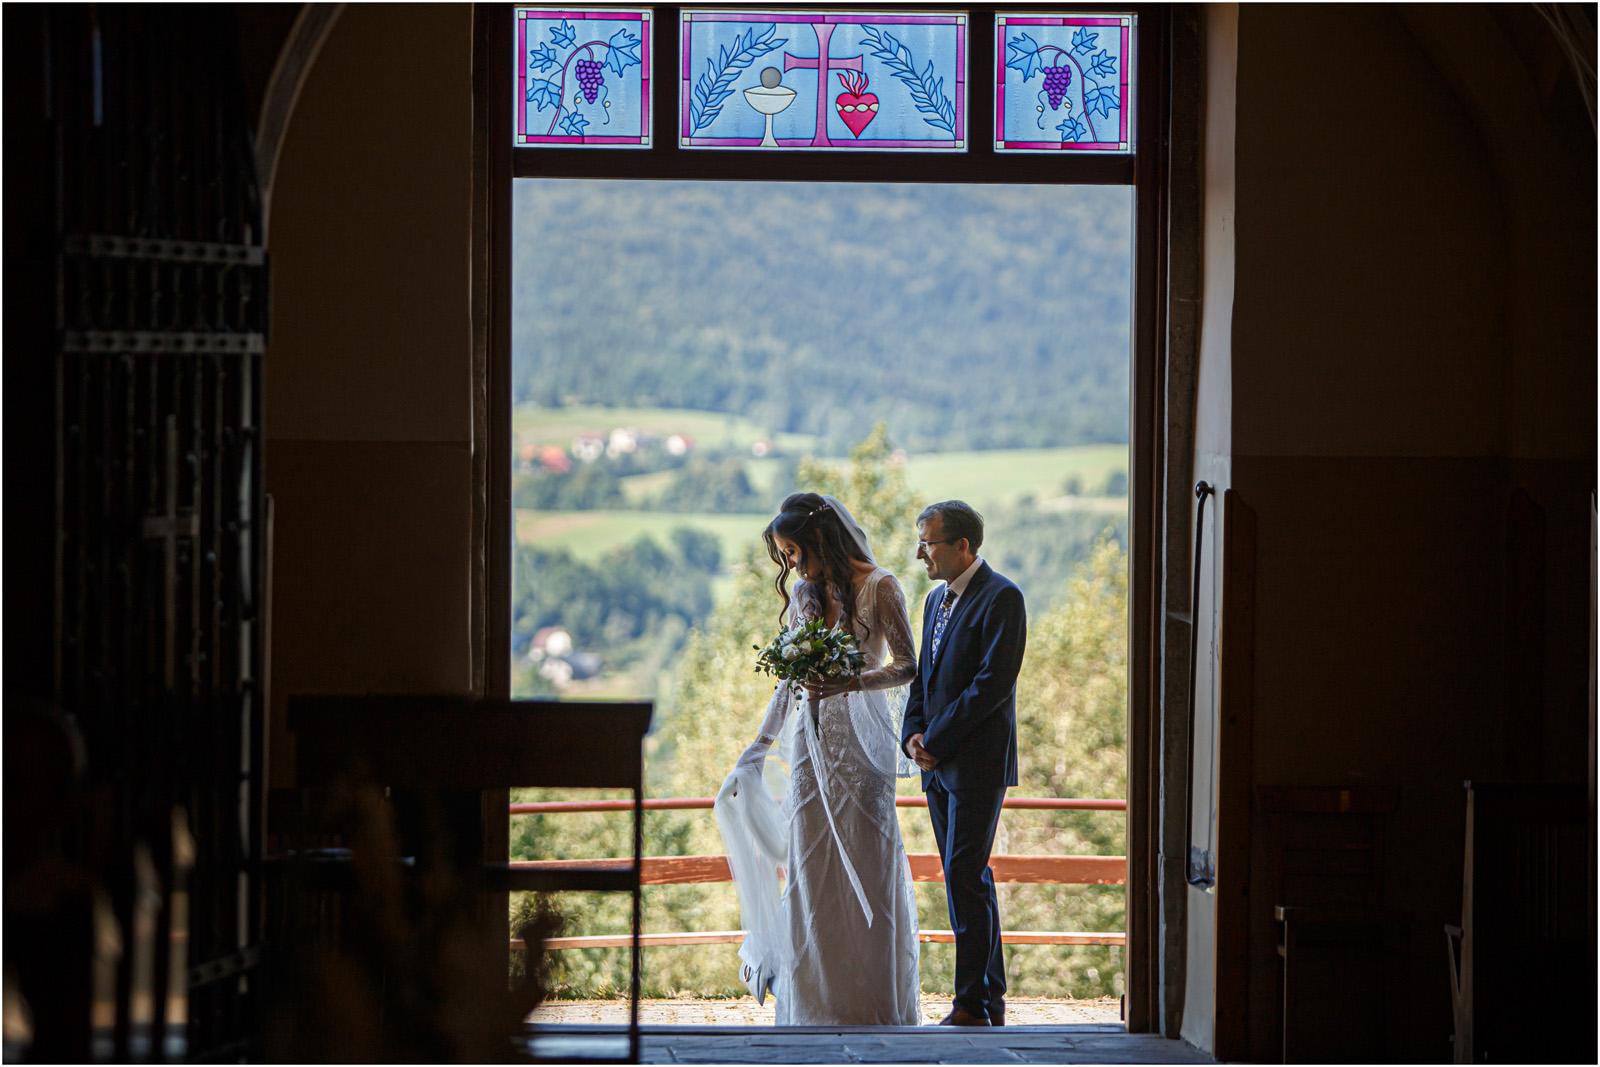 Ania & Mateusz | boho wesele w Stodole pod Kasztanami 35